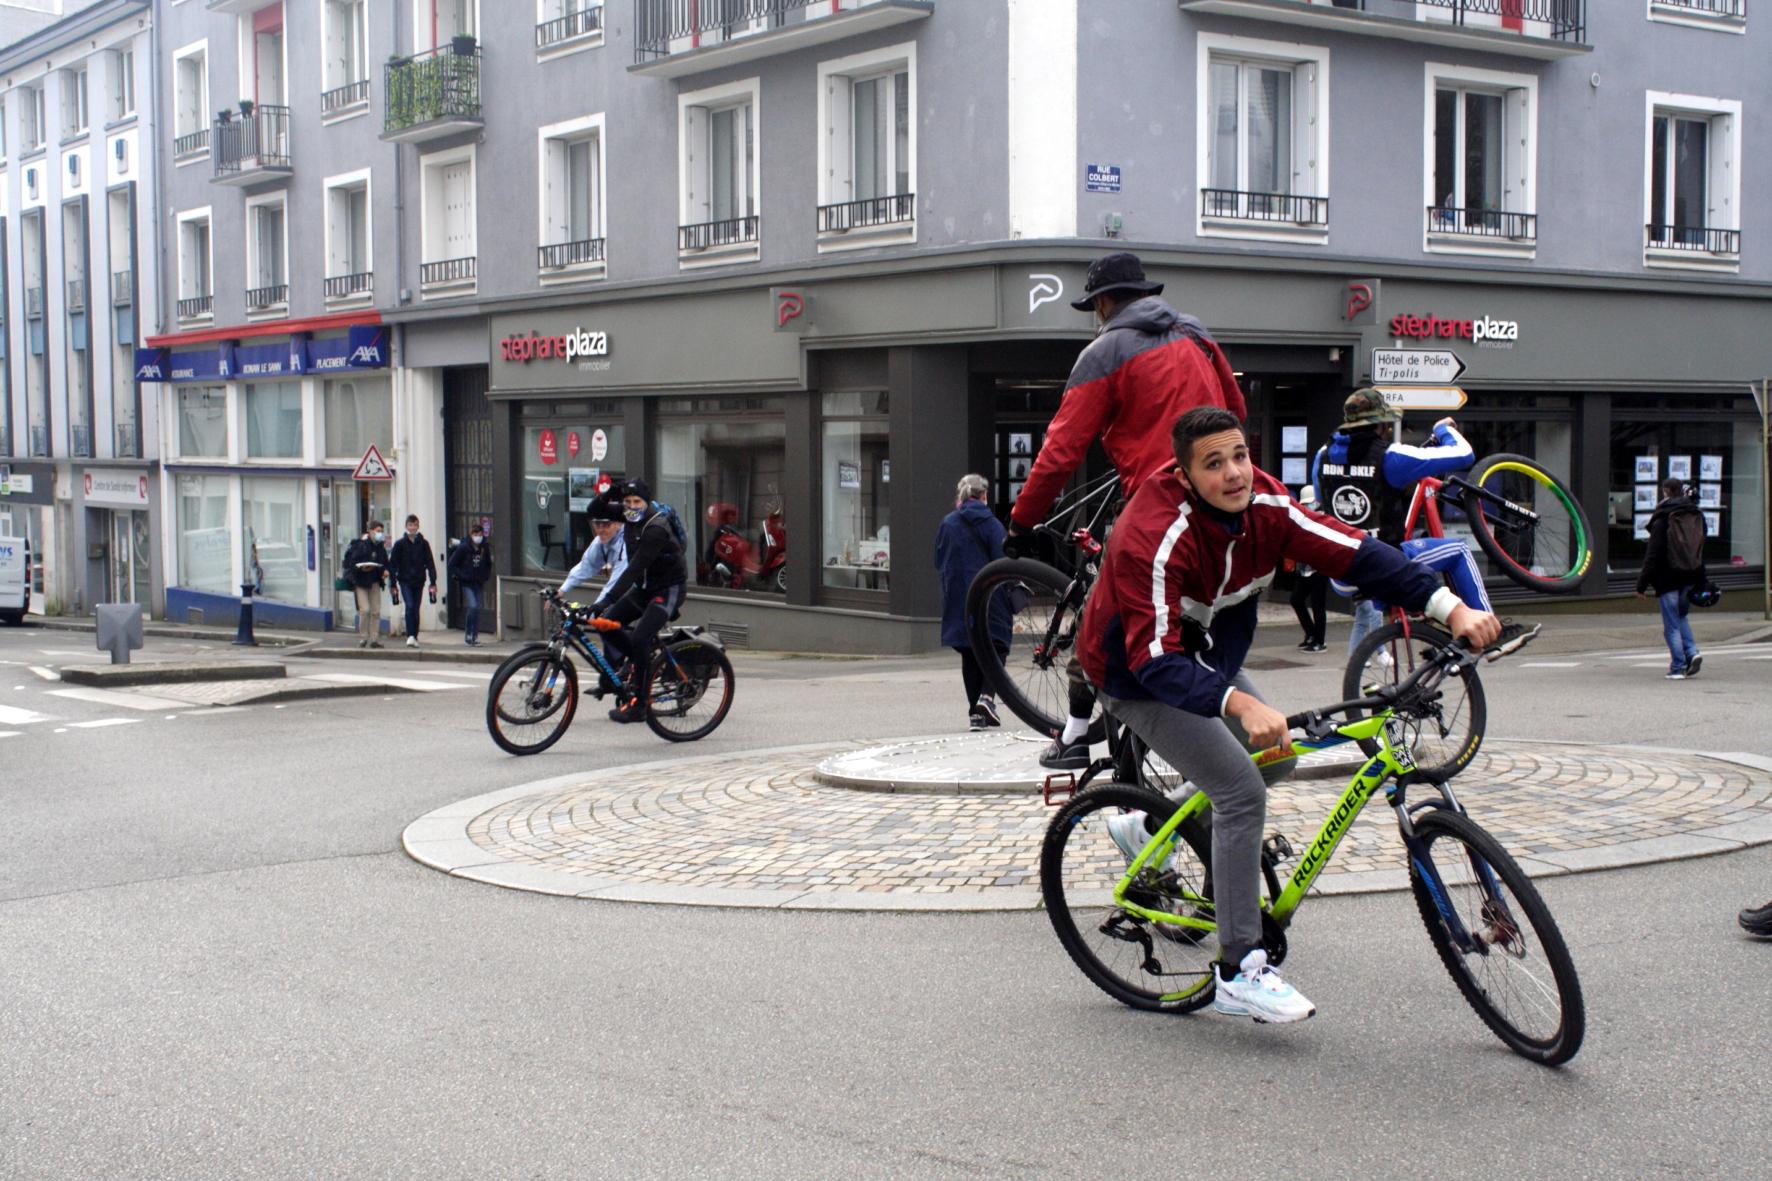 Manif-culture-Brest-20-03-21-170